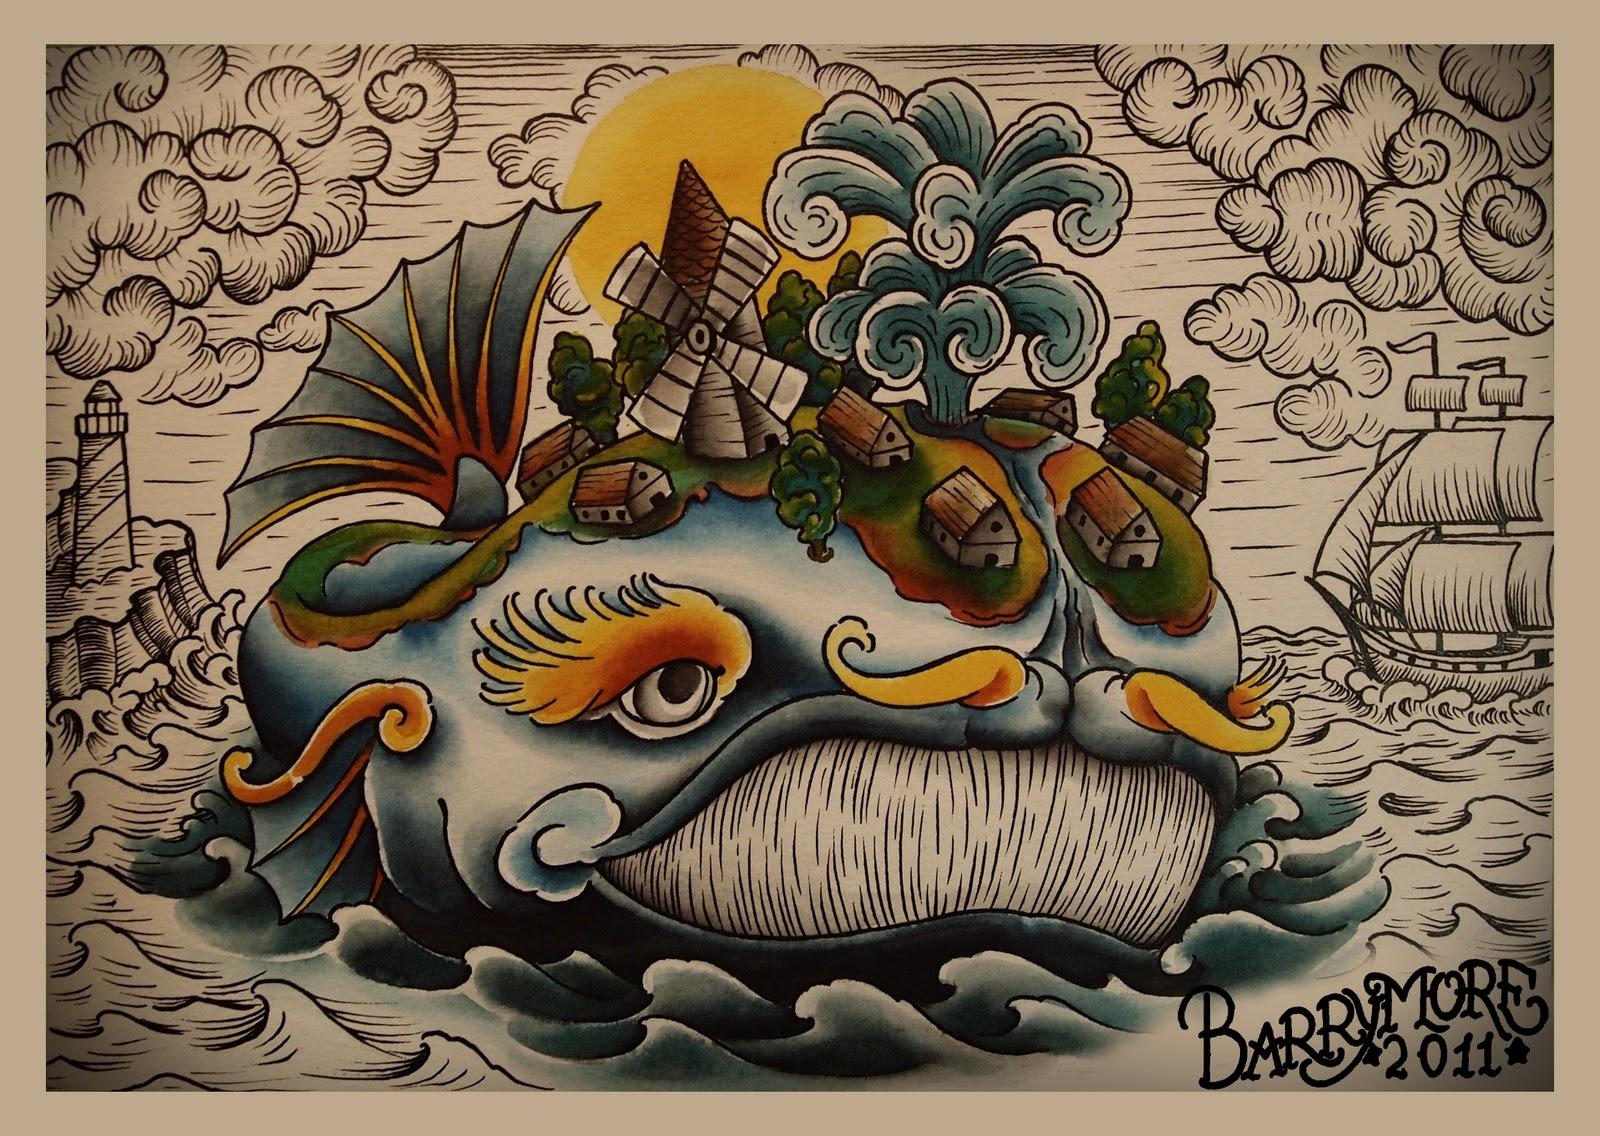 BARRYMORE TATTOO: Чудо-юдо Рыба-кит: barrymoretattoo.blogspot.com/2012/01/blog-post_18.html